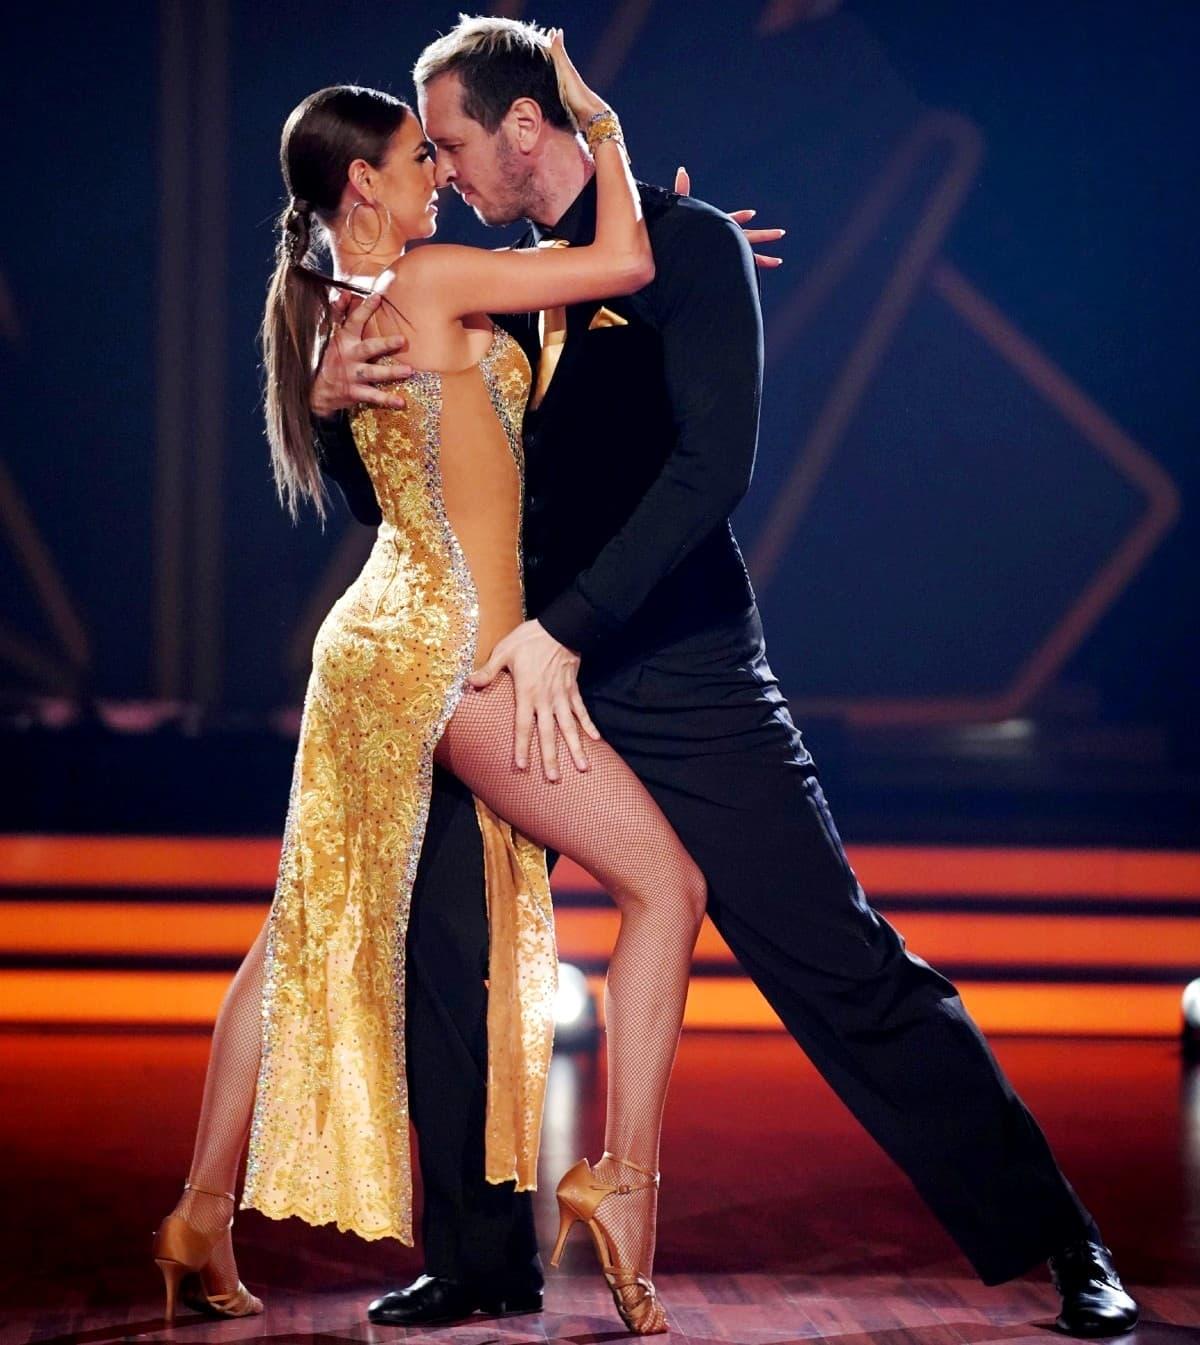 Ekaterina Leonova - Pascal Hens bei Let's dance am 29.3.2019